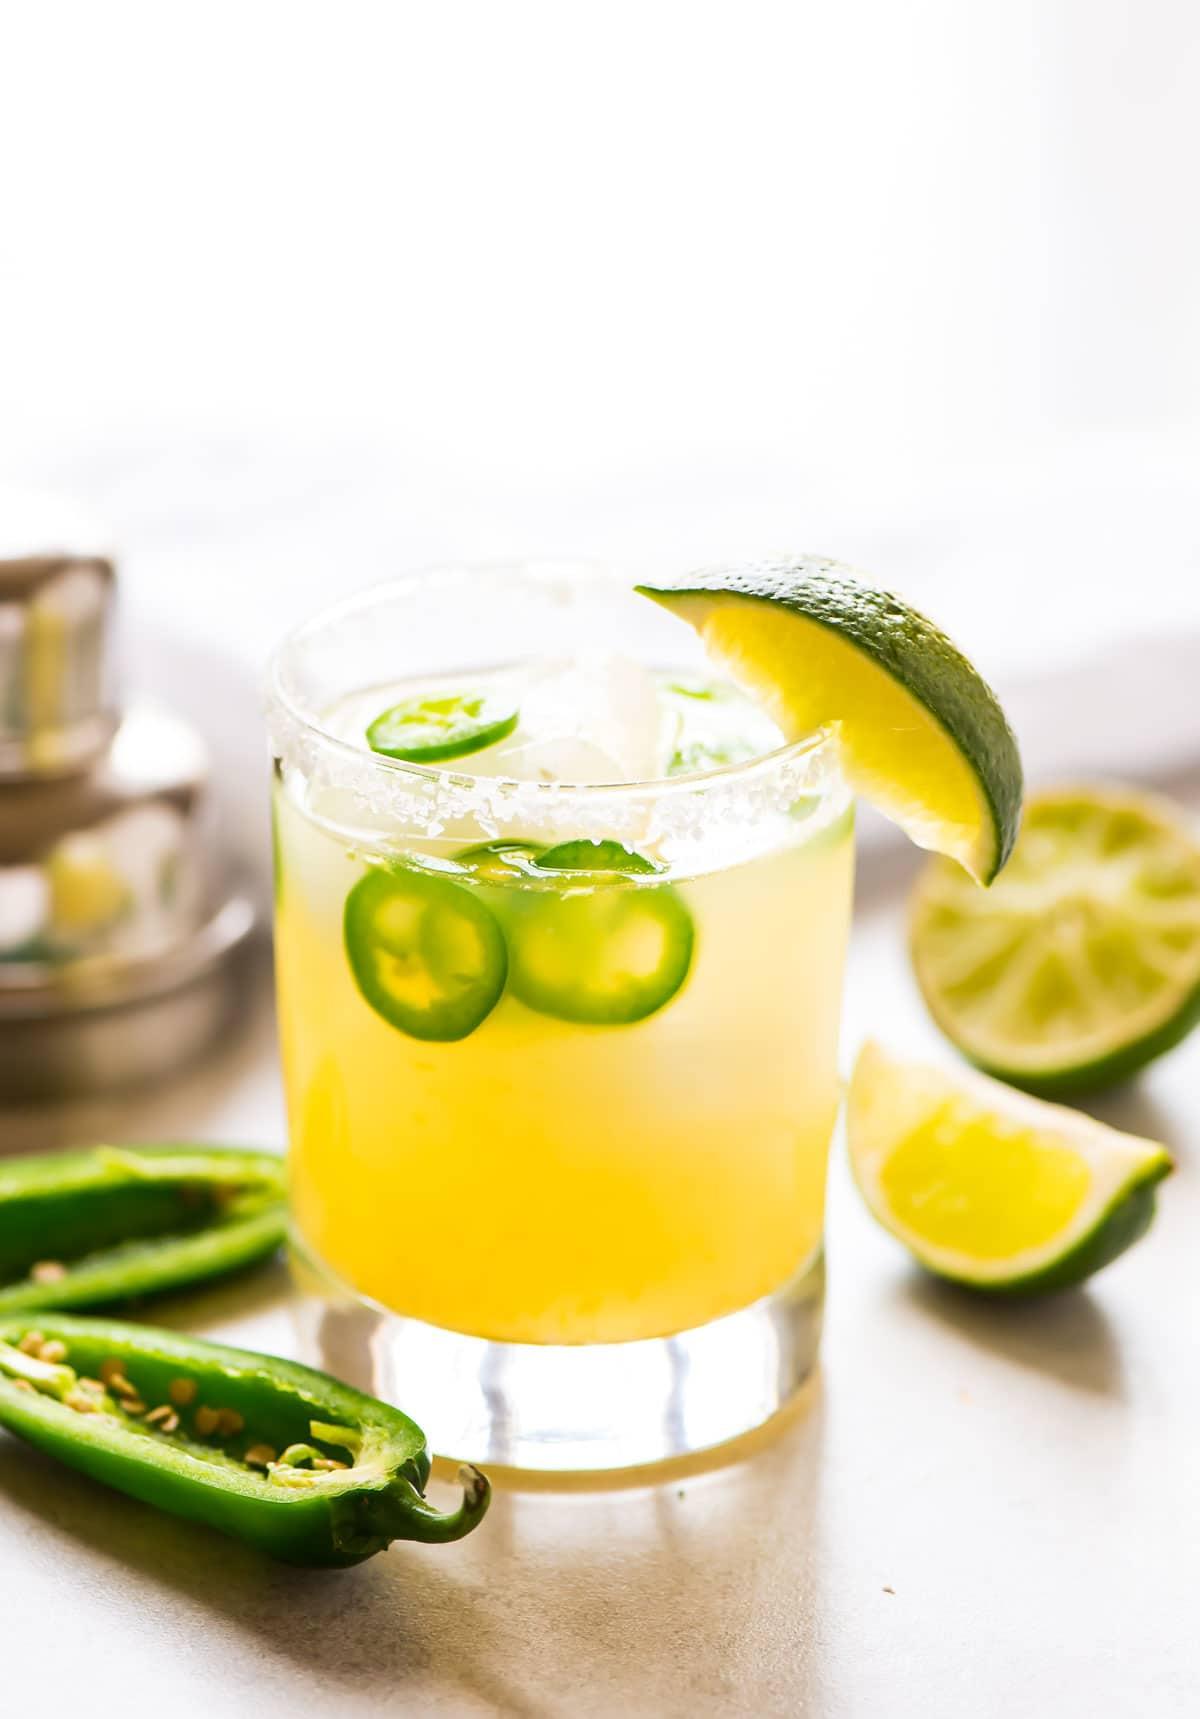 Nyc Fresh Juice Bar